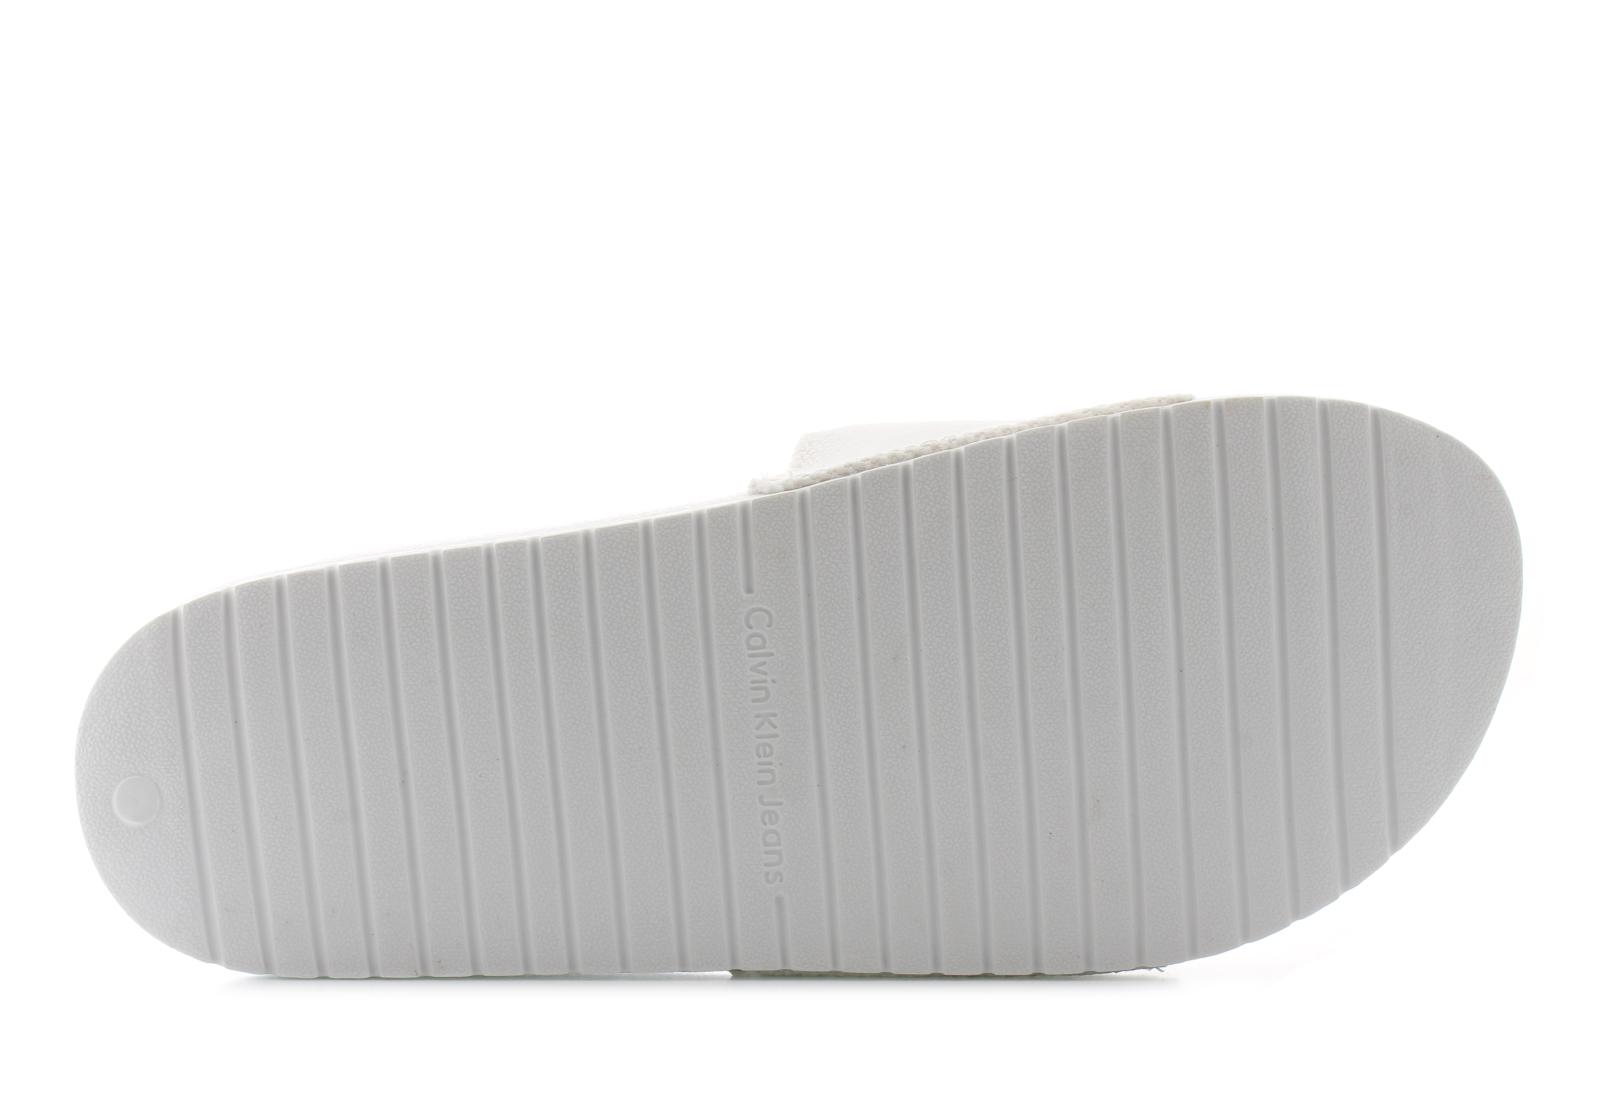 Calvin Klein Jeans Slippers - Viggo - SE8535-WHT - Online shop for ... 0e35db99df